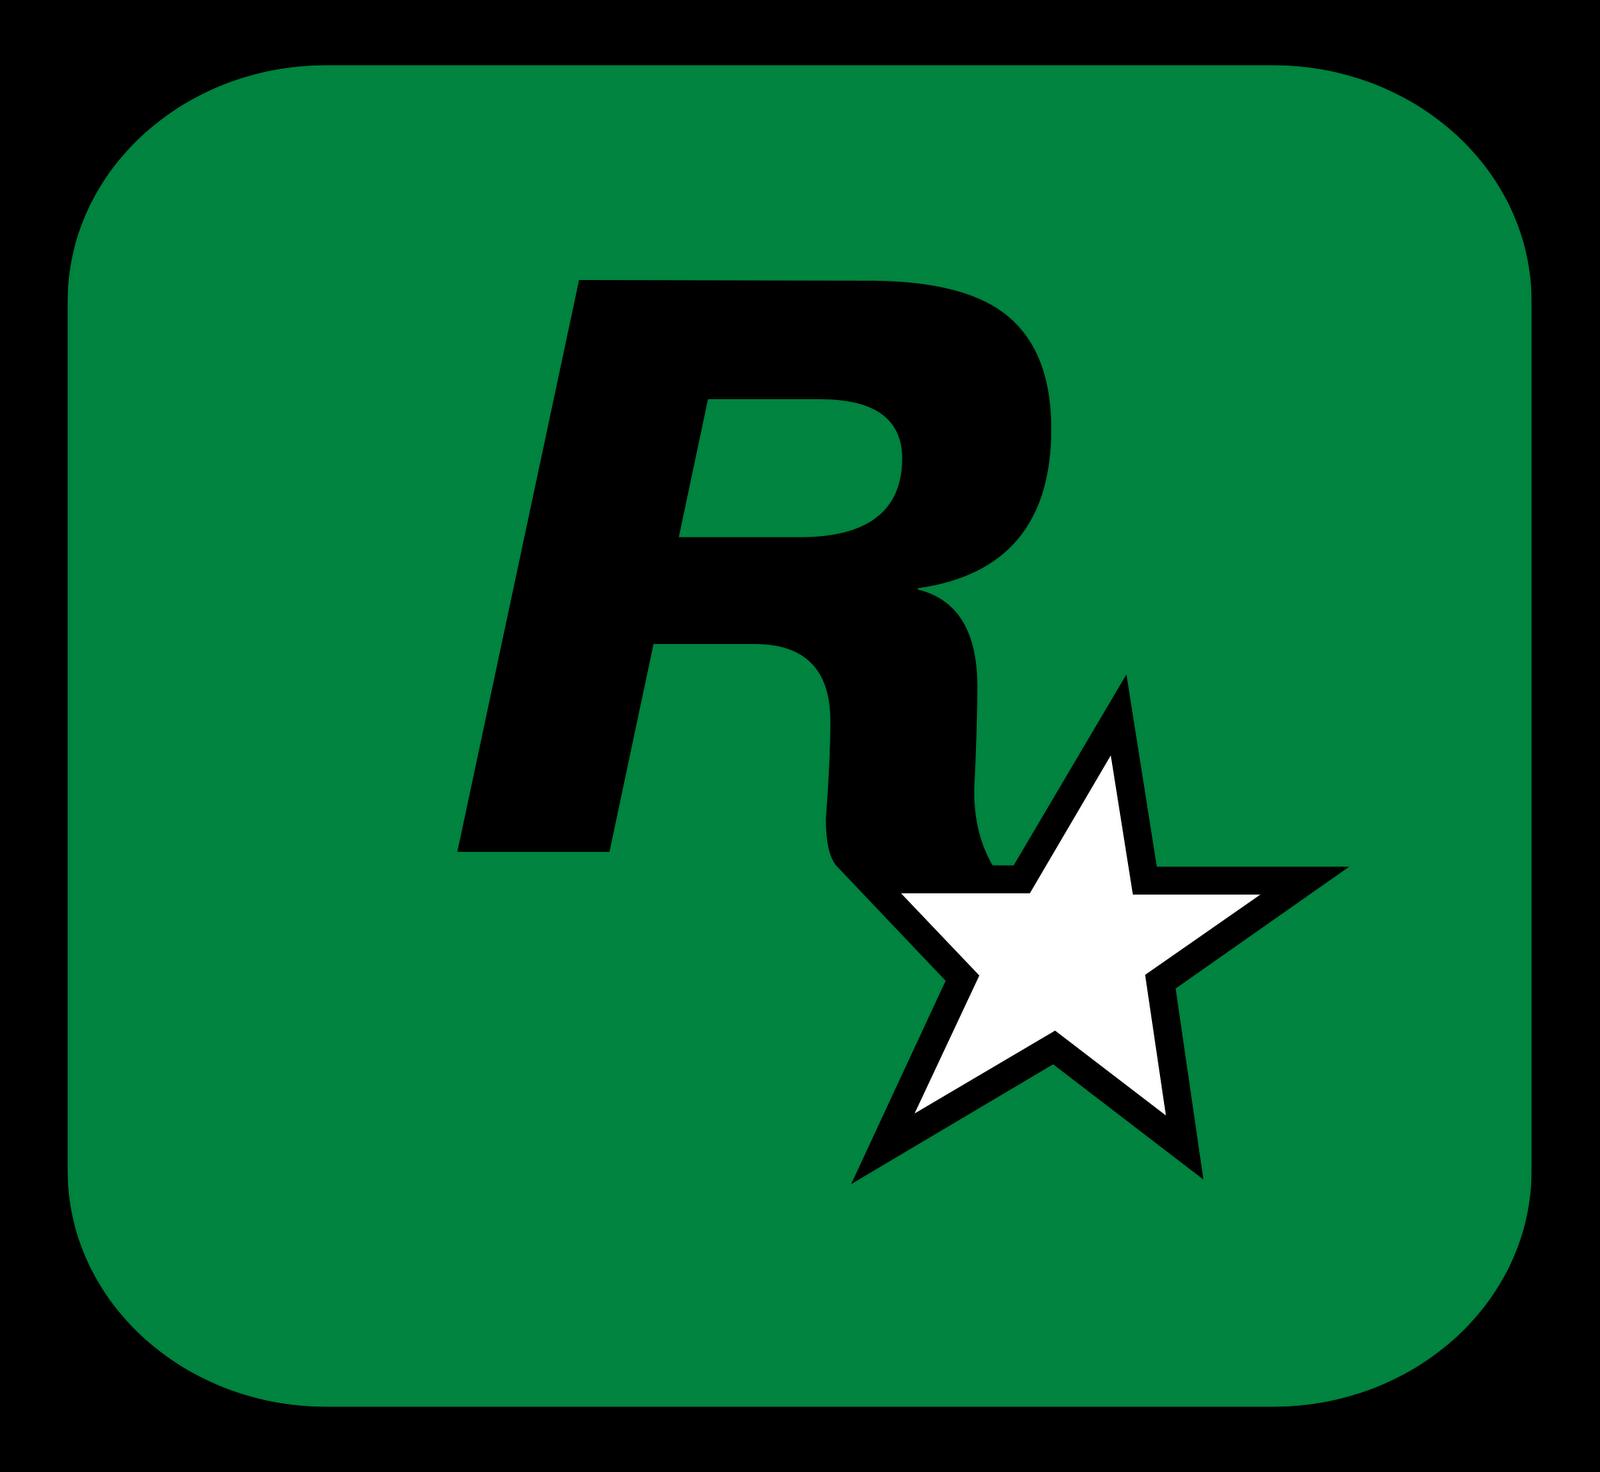 Rockstar Games Logo photo - 1